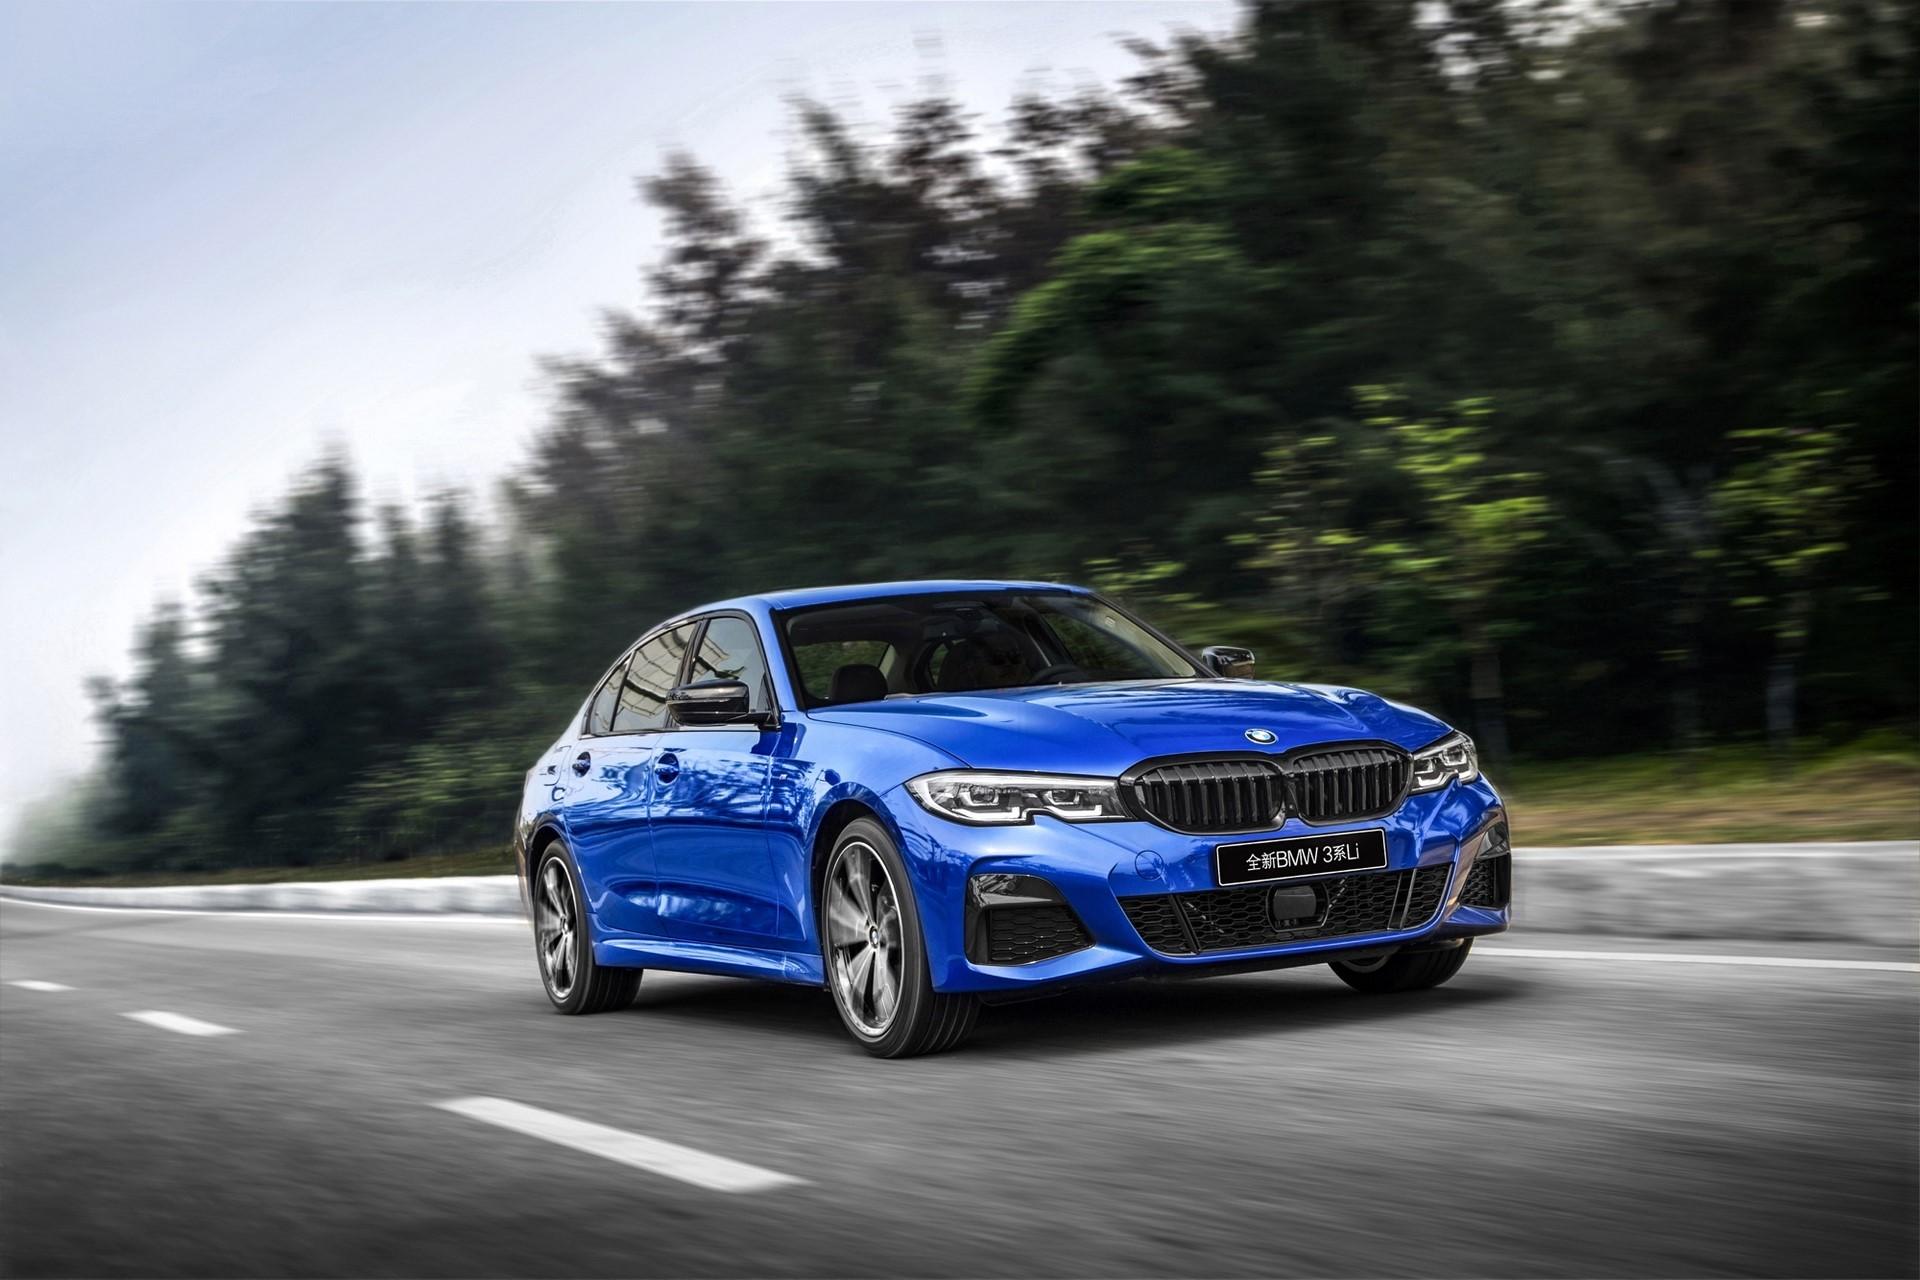 BMW-3-Series-LWB-Long-Wheelbase-2019-13